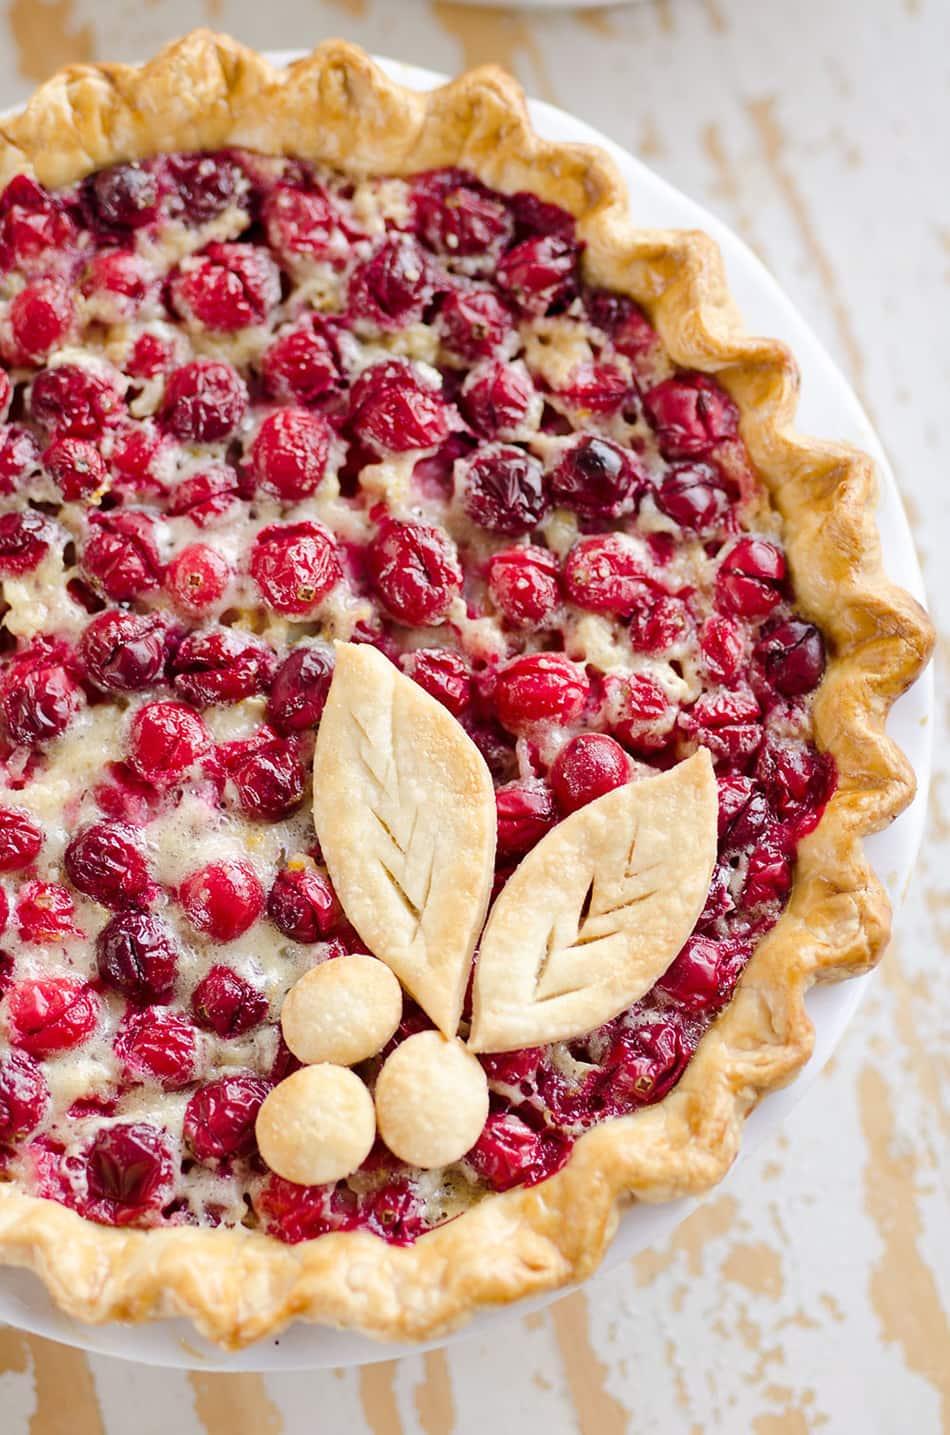 Cranberry Orange Custard Pie | The Creative Bite